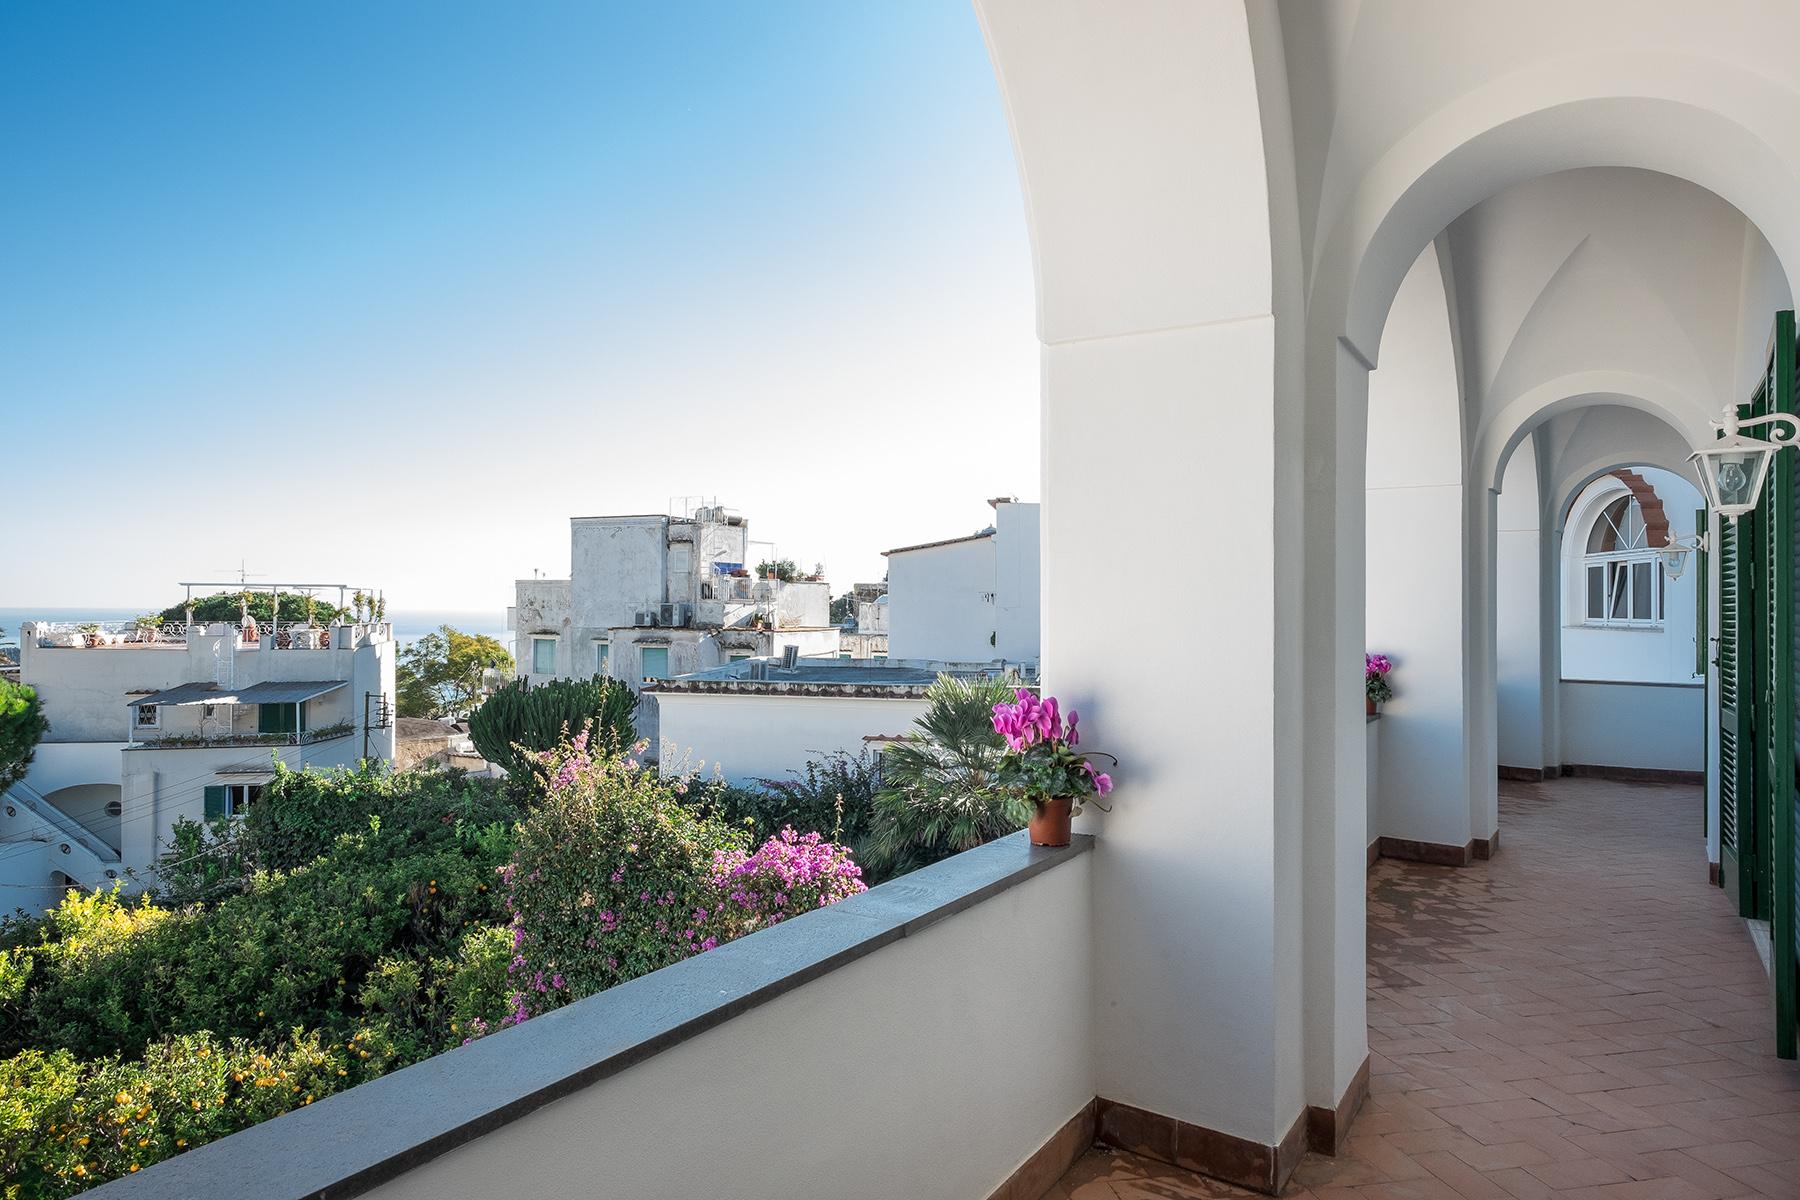 Casa indipendente in Vendita a Capri: 5 locali, 400 mq - Foto 5